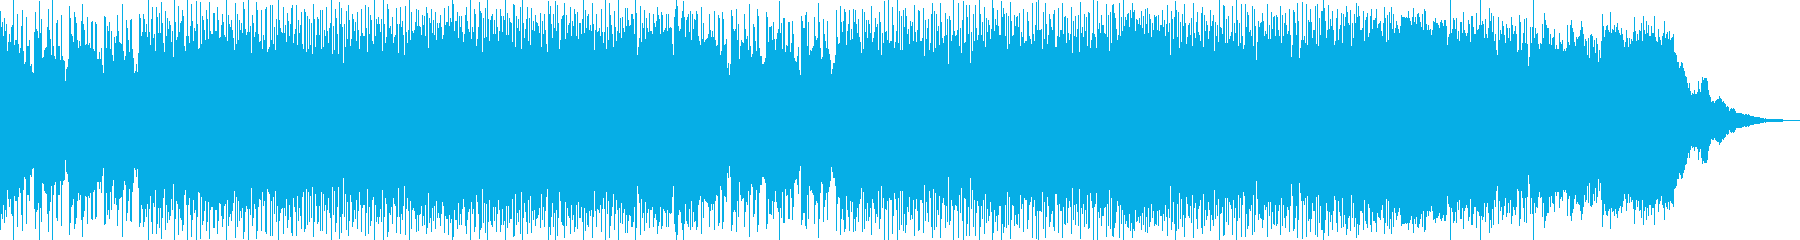 YOUTUBE/動画に使えるBGMの再生済みの波形